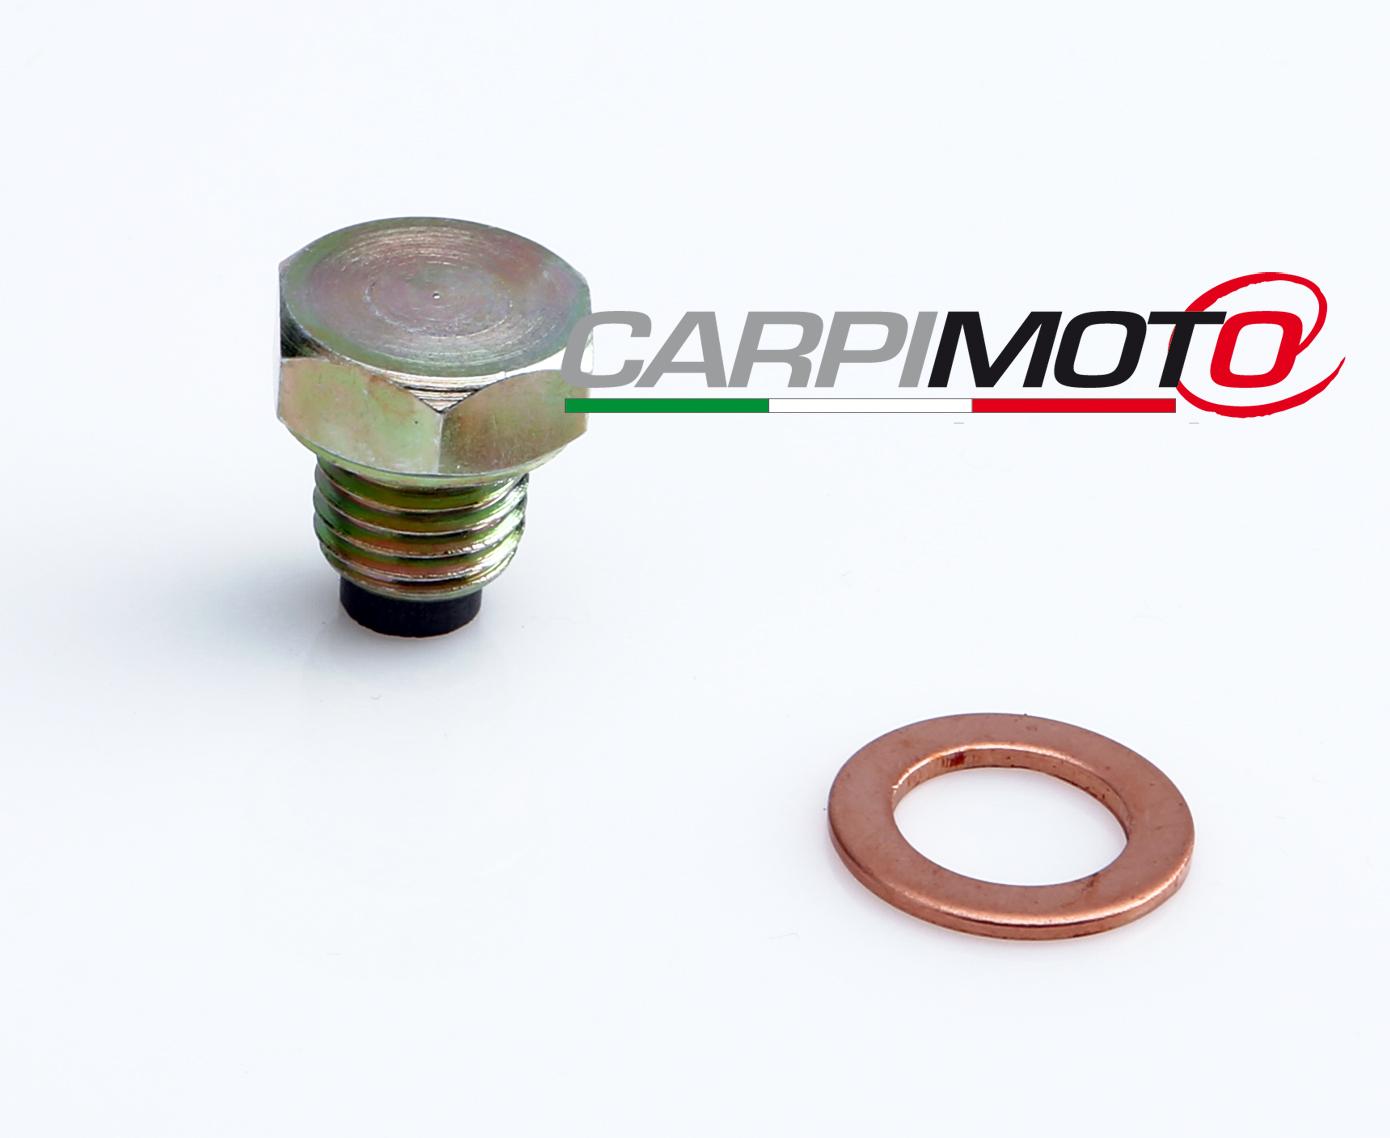 Magnetic Oil Drain Plug Bolt /& Washer For Honda XR 125 L 2003-2006